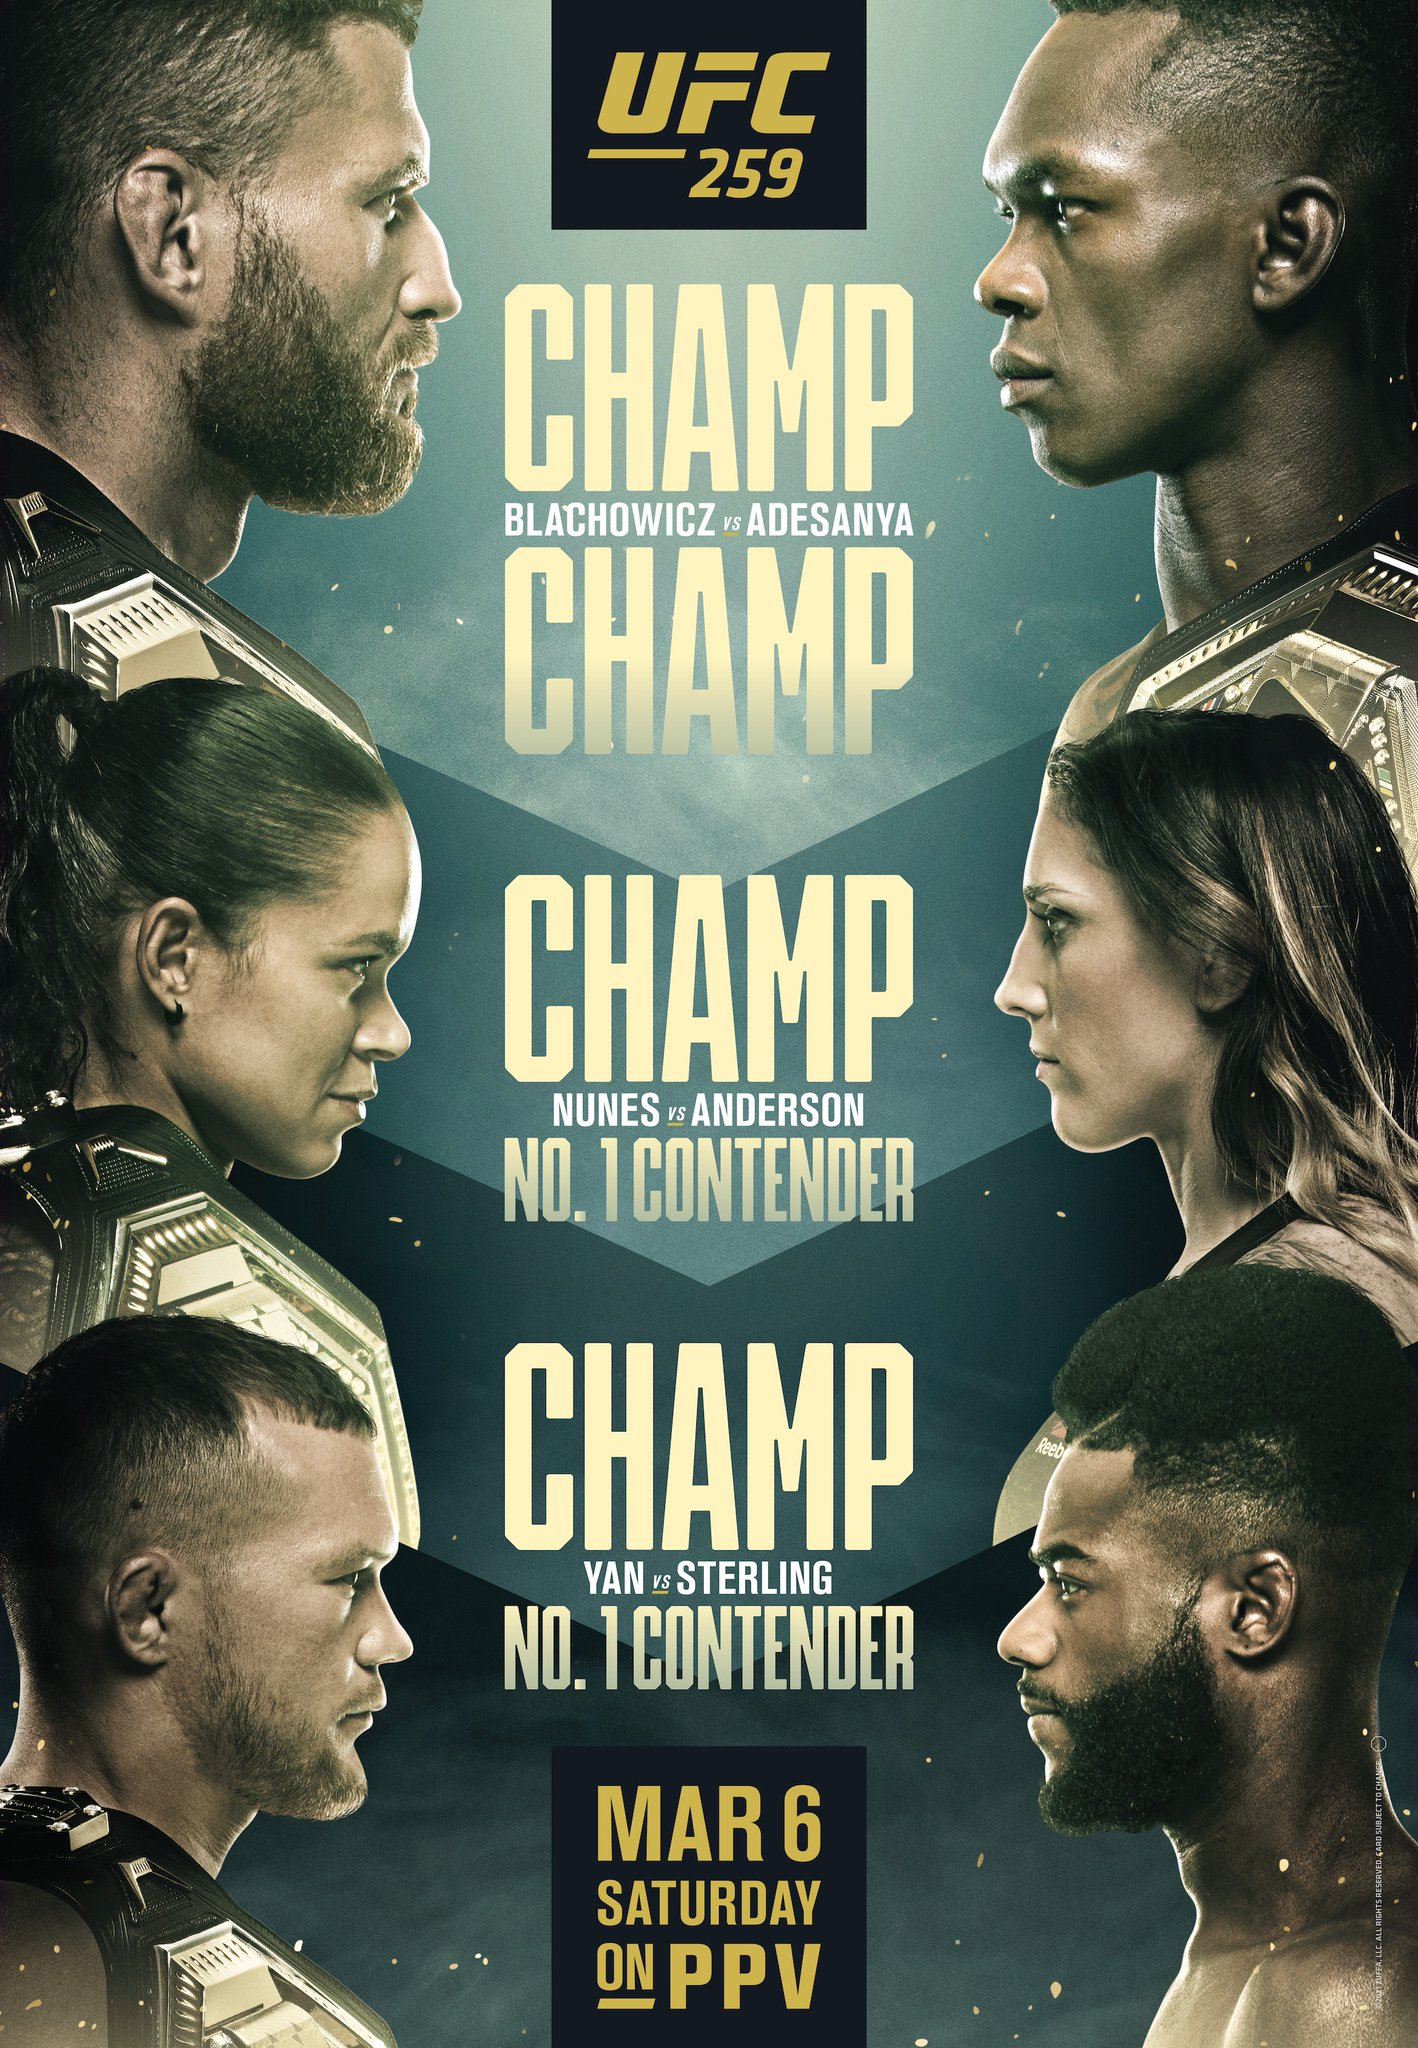 "UFC on Twitter: ""WELCOME TO FIGHT WEEK. 🏆🇵🇱 @JanBlachowicz vs 🇳🇿🏆  @Stylebender 🏆🏆 @Amanda_Leoa vs 🇦🇺 @MeganA_MMA 🏆🇷🇺 @PetrYanUFC vs  🇯🇲 @FunkmasterMMA #UFC259… https://t.co/mMz8WGFr7x"""